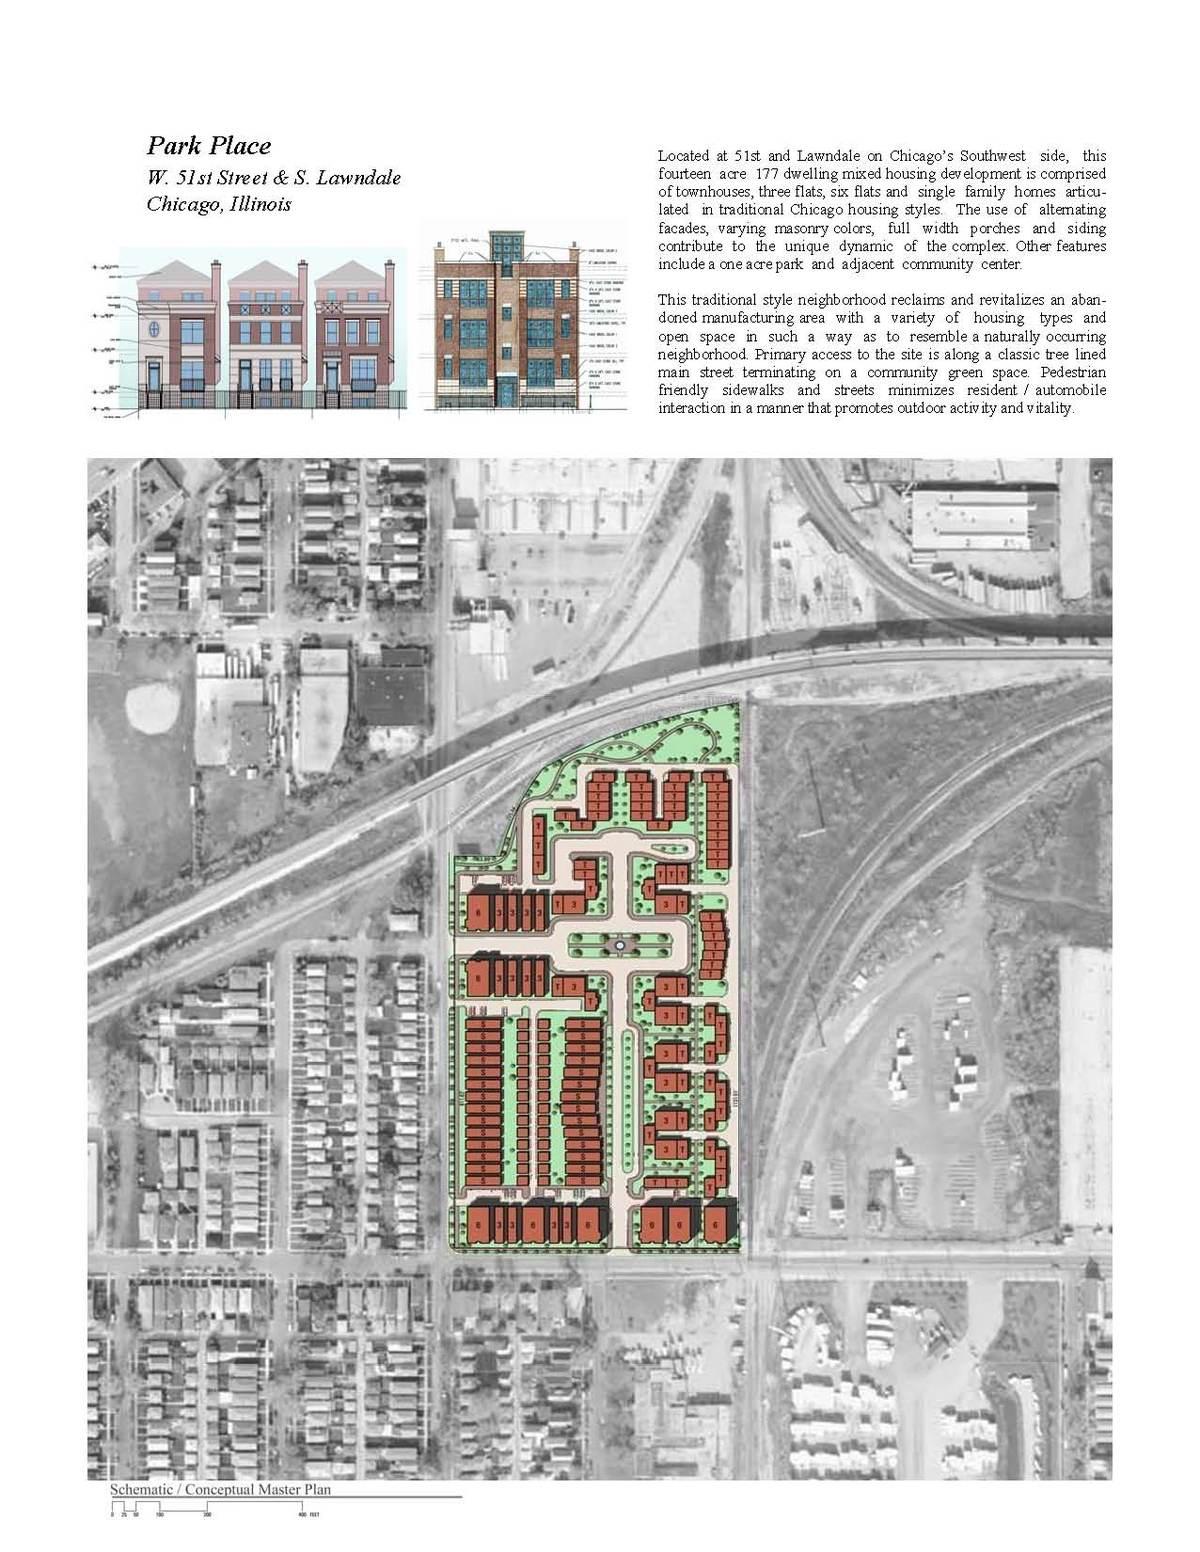 Park Place Residential Development